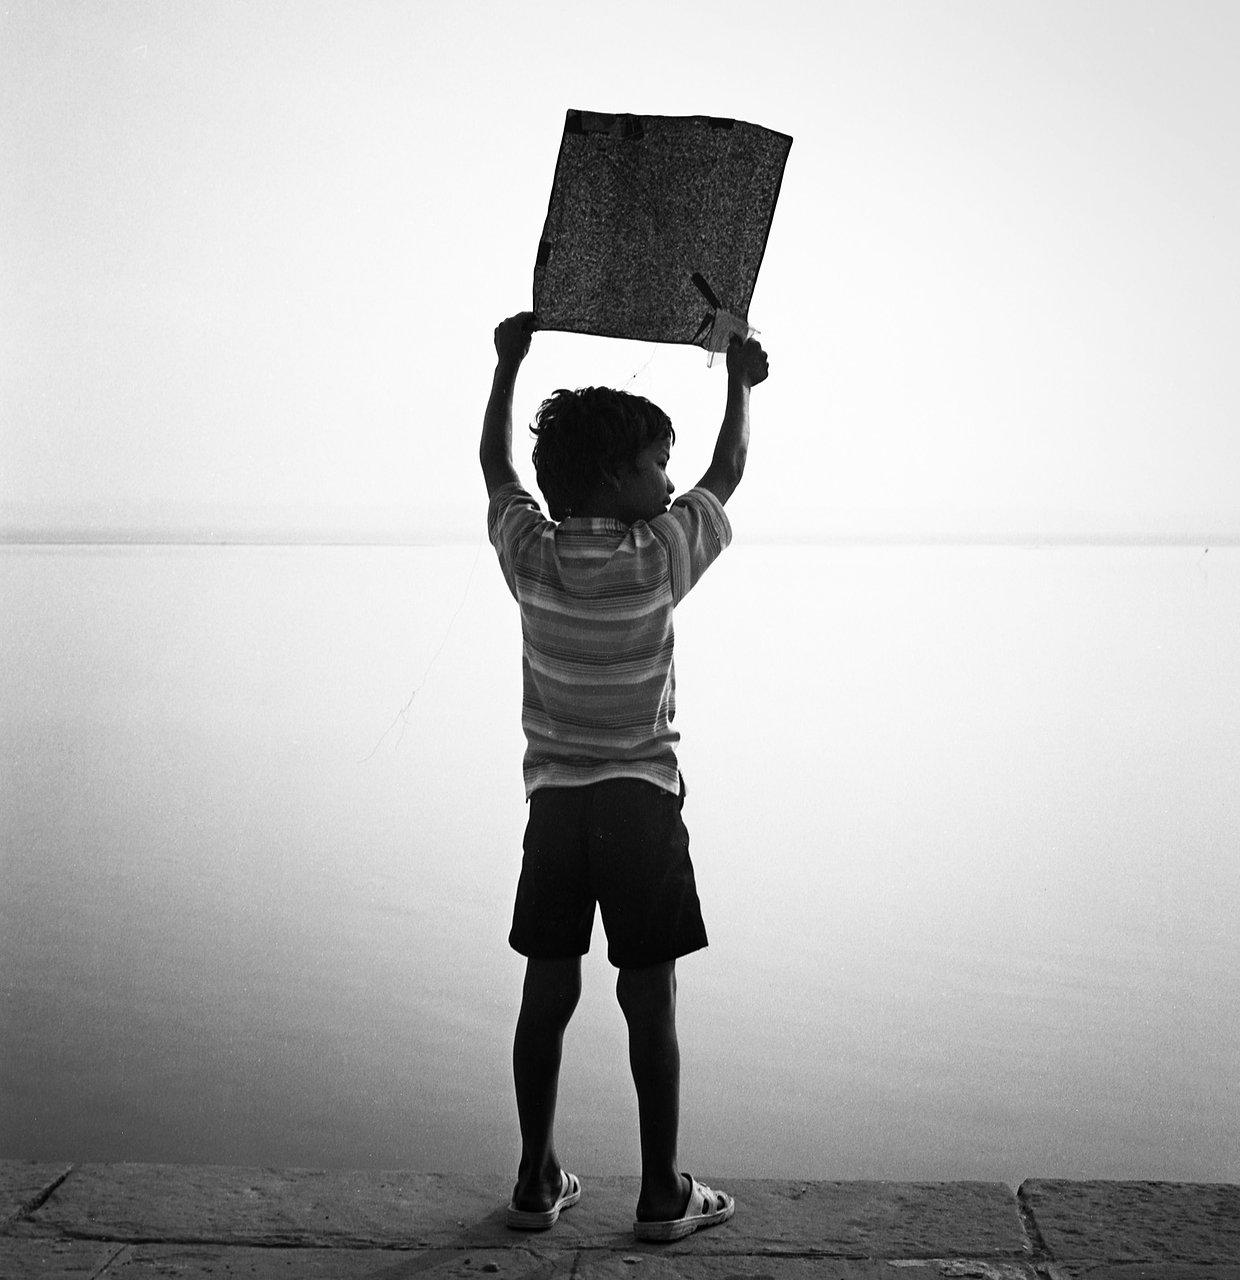 Kite boy, Varanassi